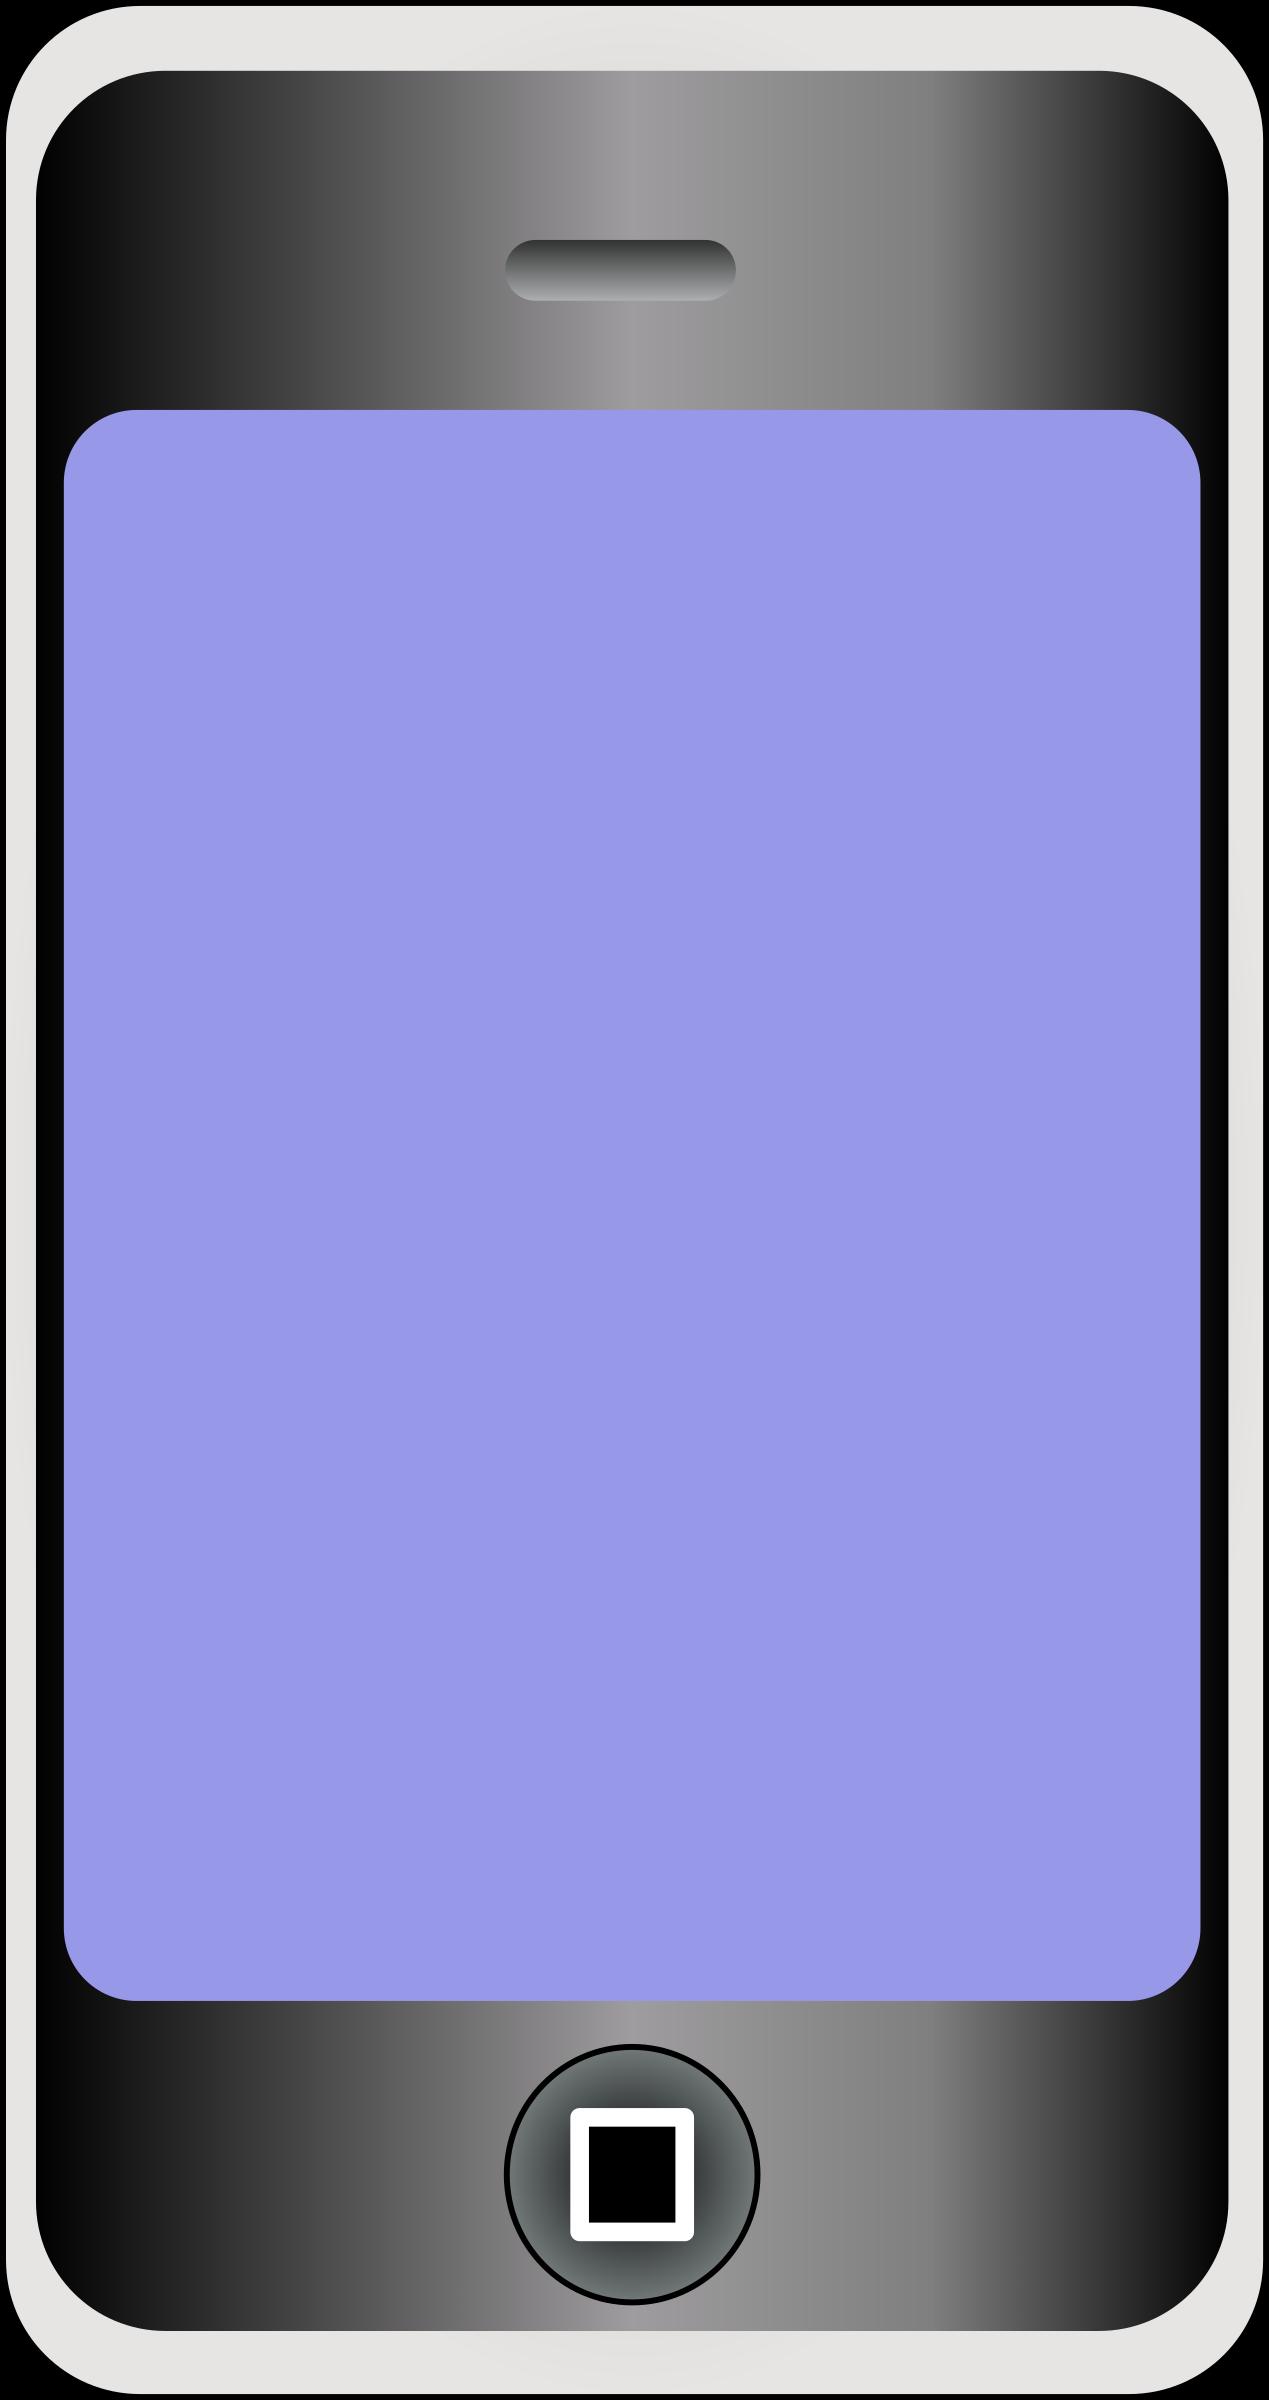 Phone Screen Clipart.